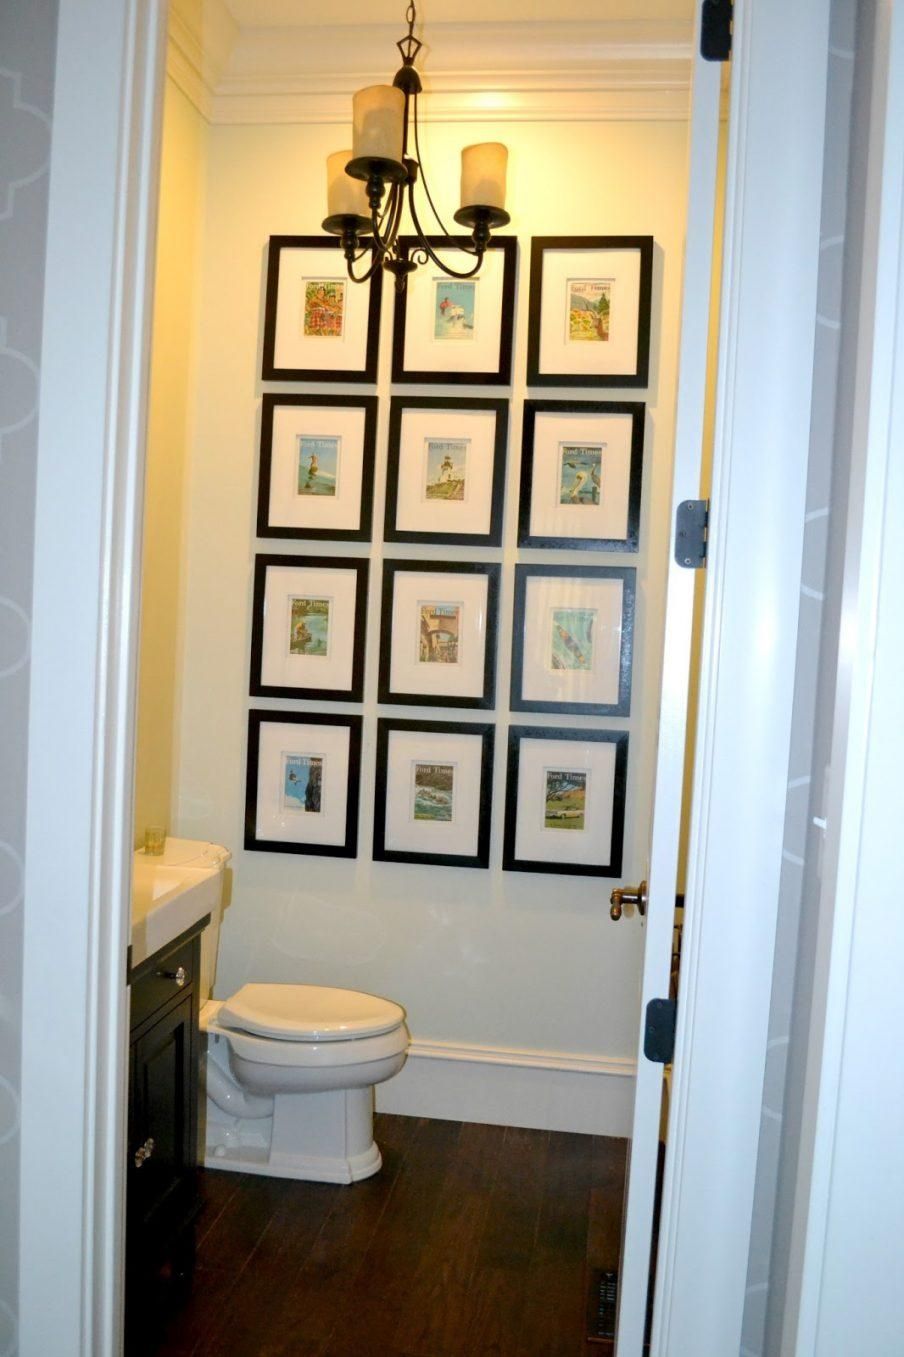 Pretty Bathroom Wall Art Ideas Small Wallrt Teal Printsrgos In Red Bathroom Wall Art (Image 13 of 20)